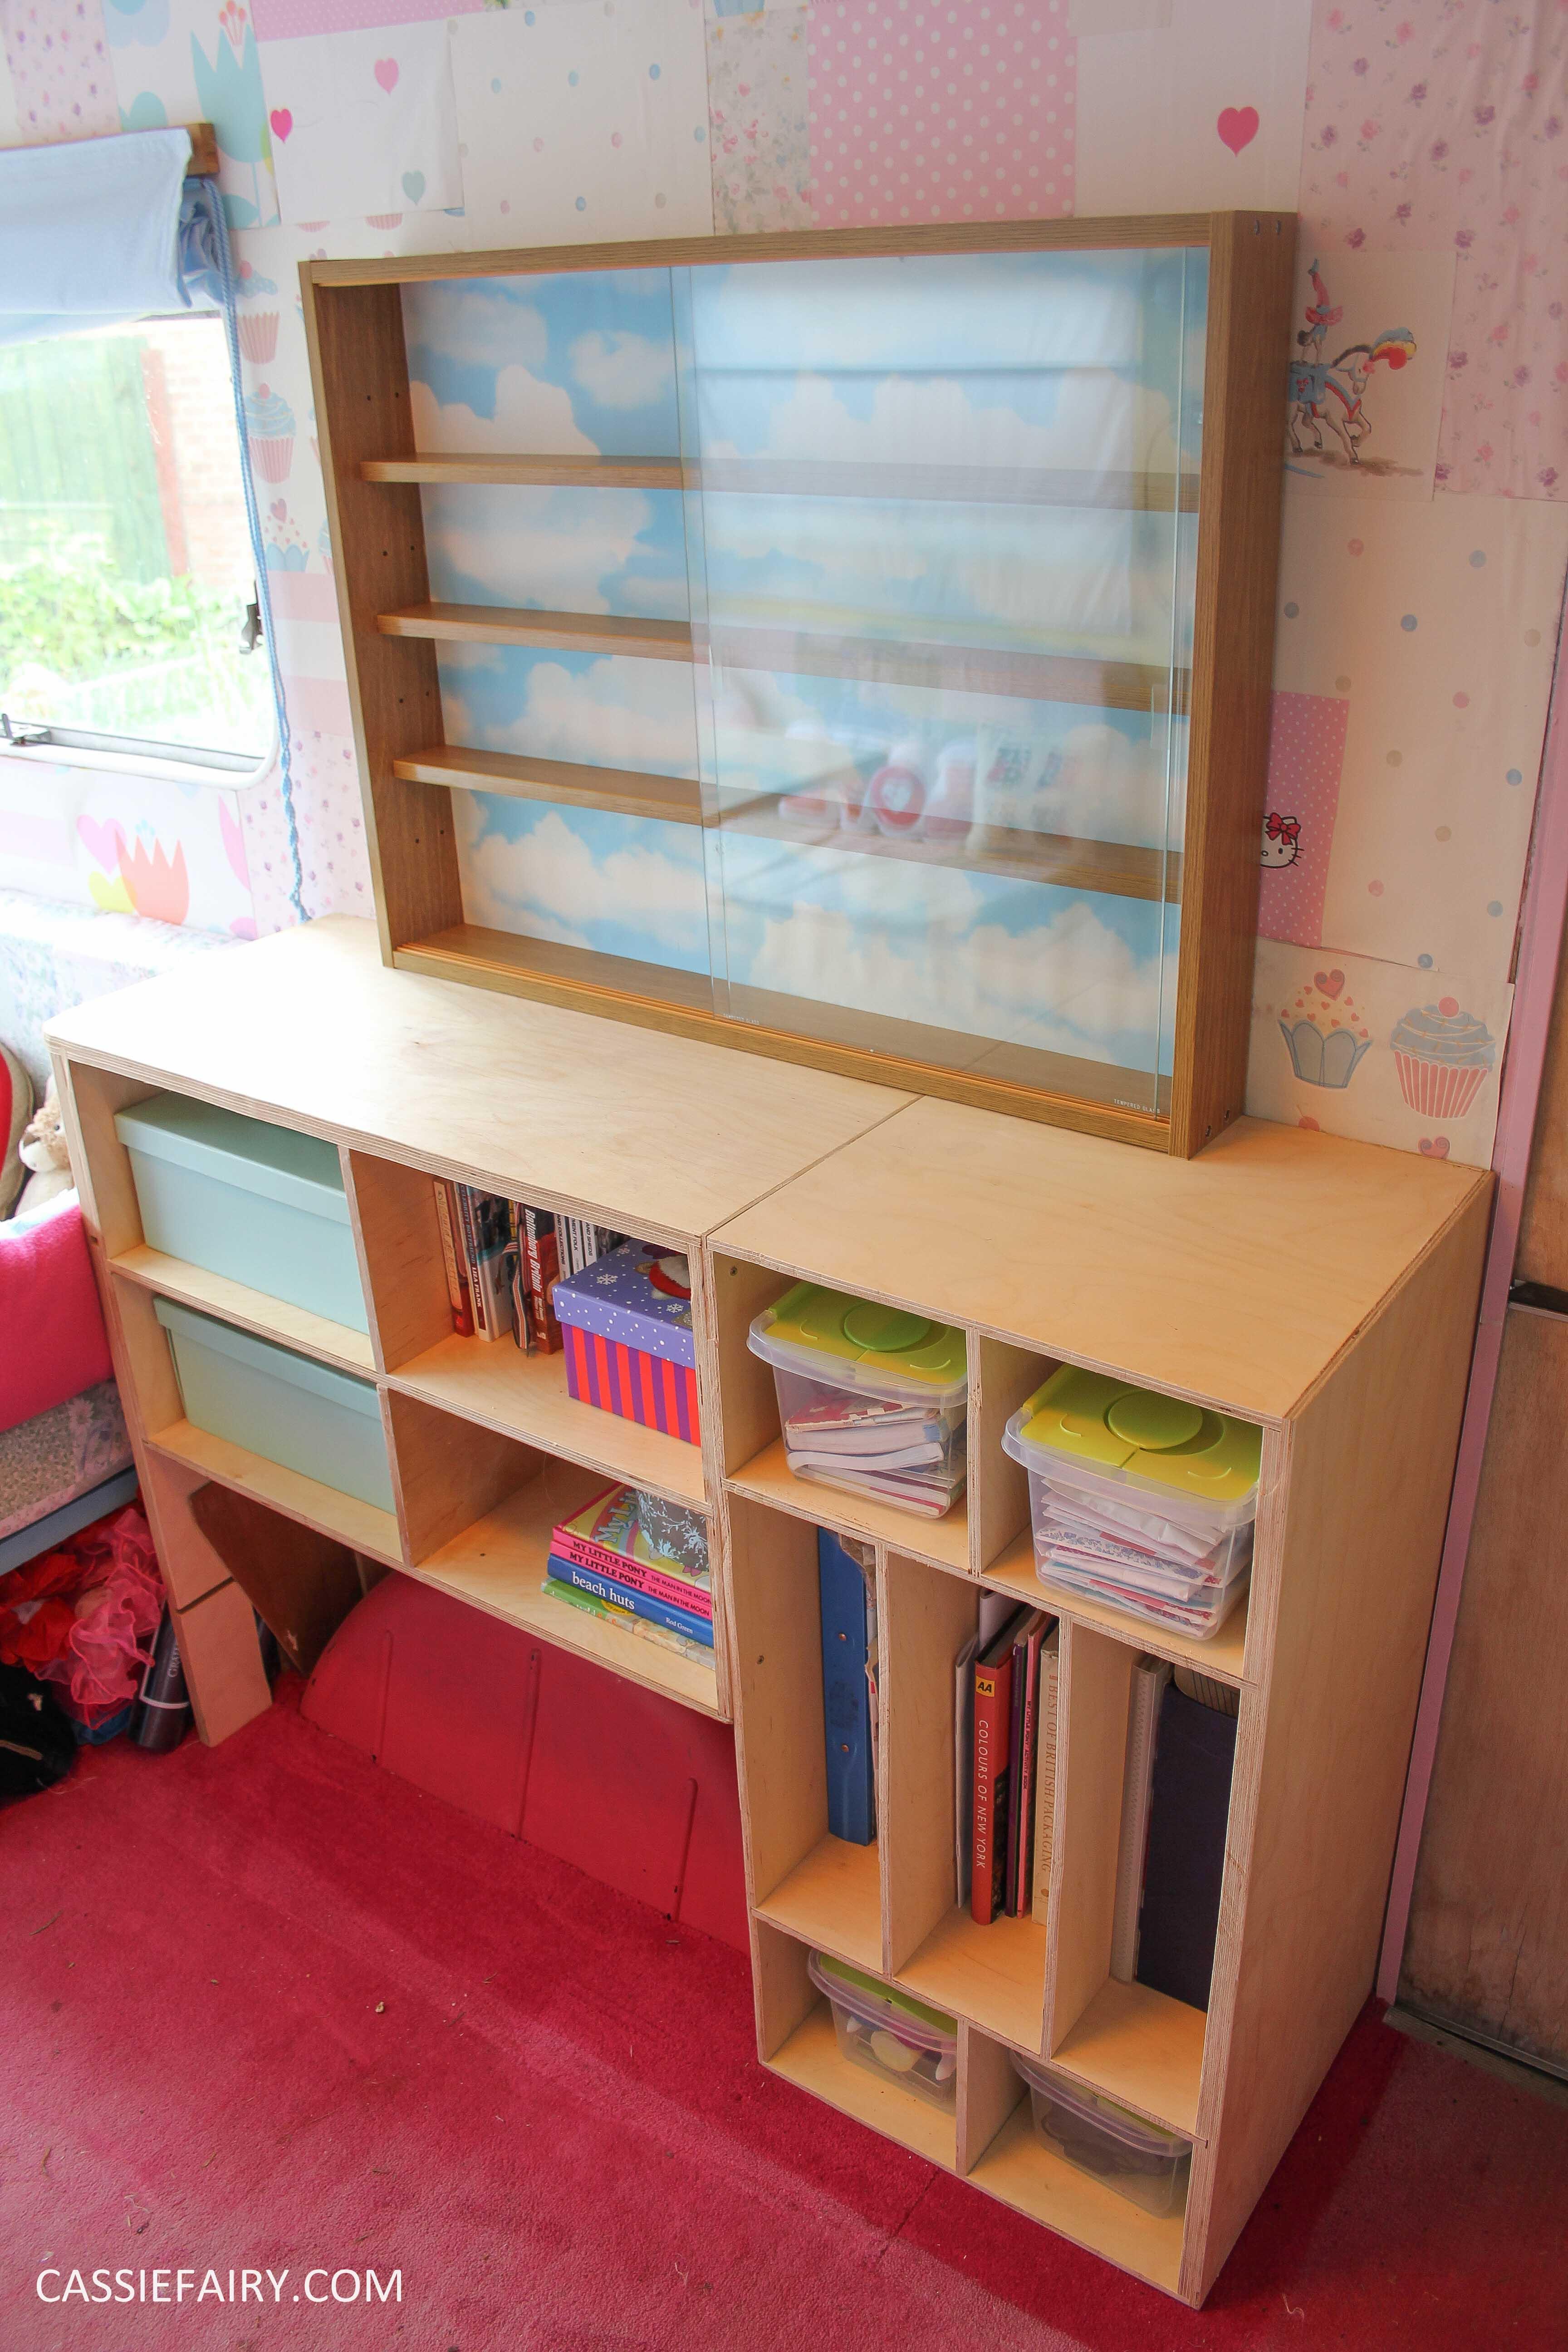 diy display cabinet makeover for vintage caravan_-6 | Cassiefairy - My ...